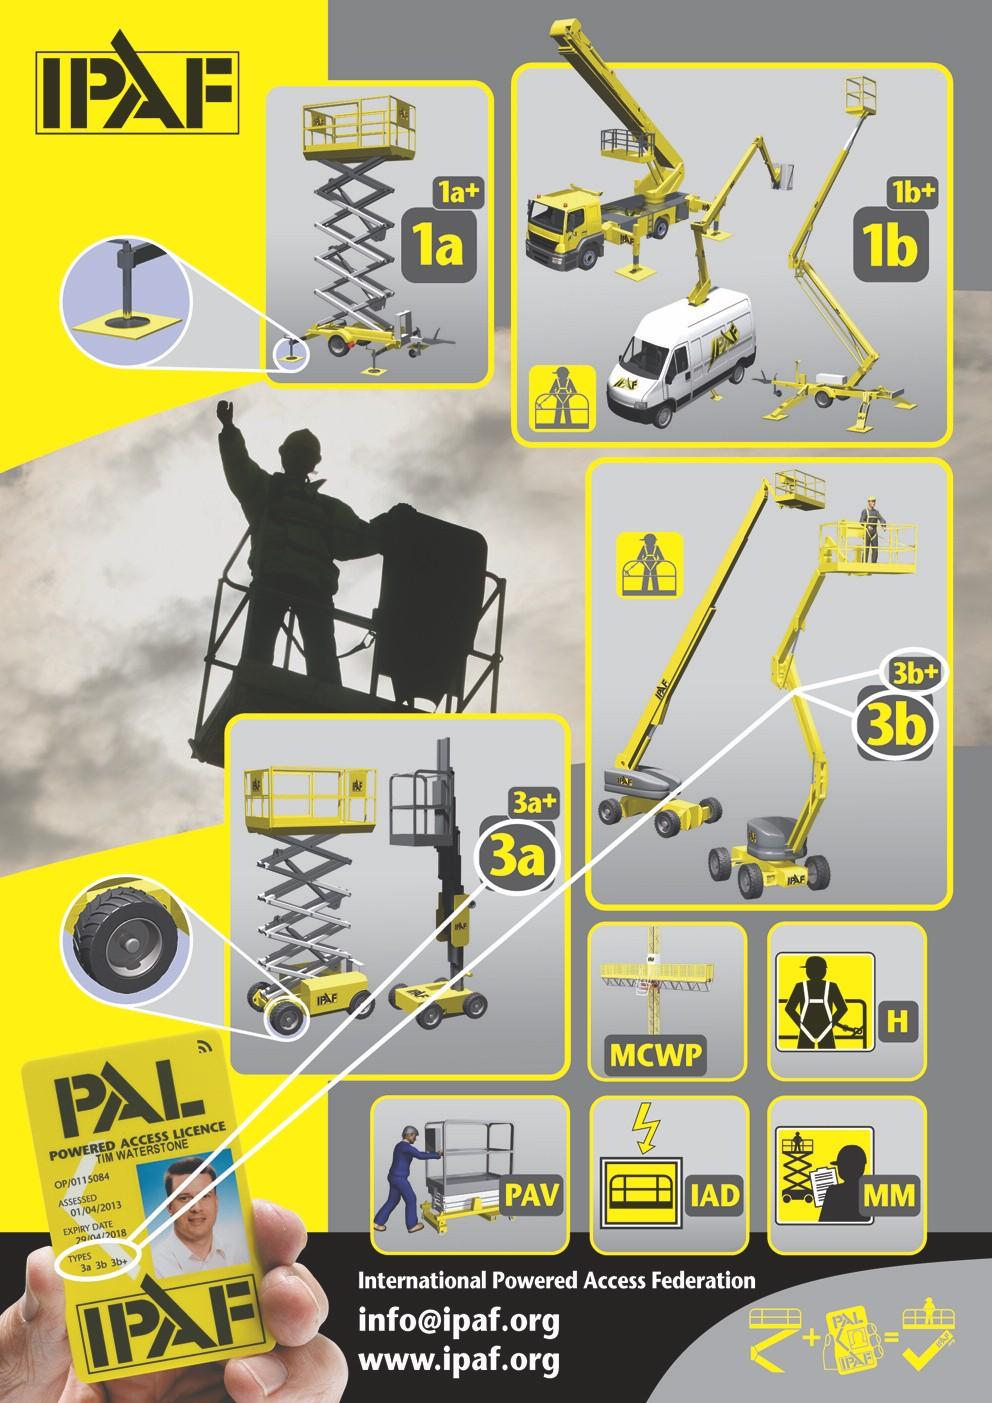 Poster IPAF-Gerätekategorien